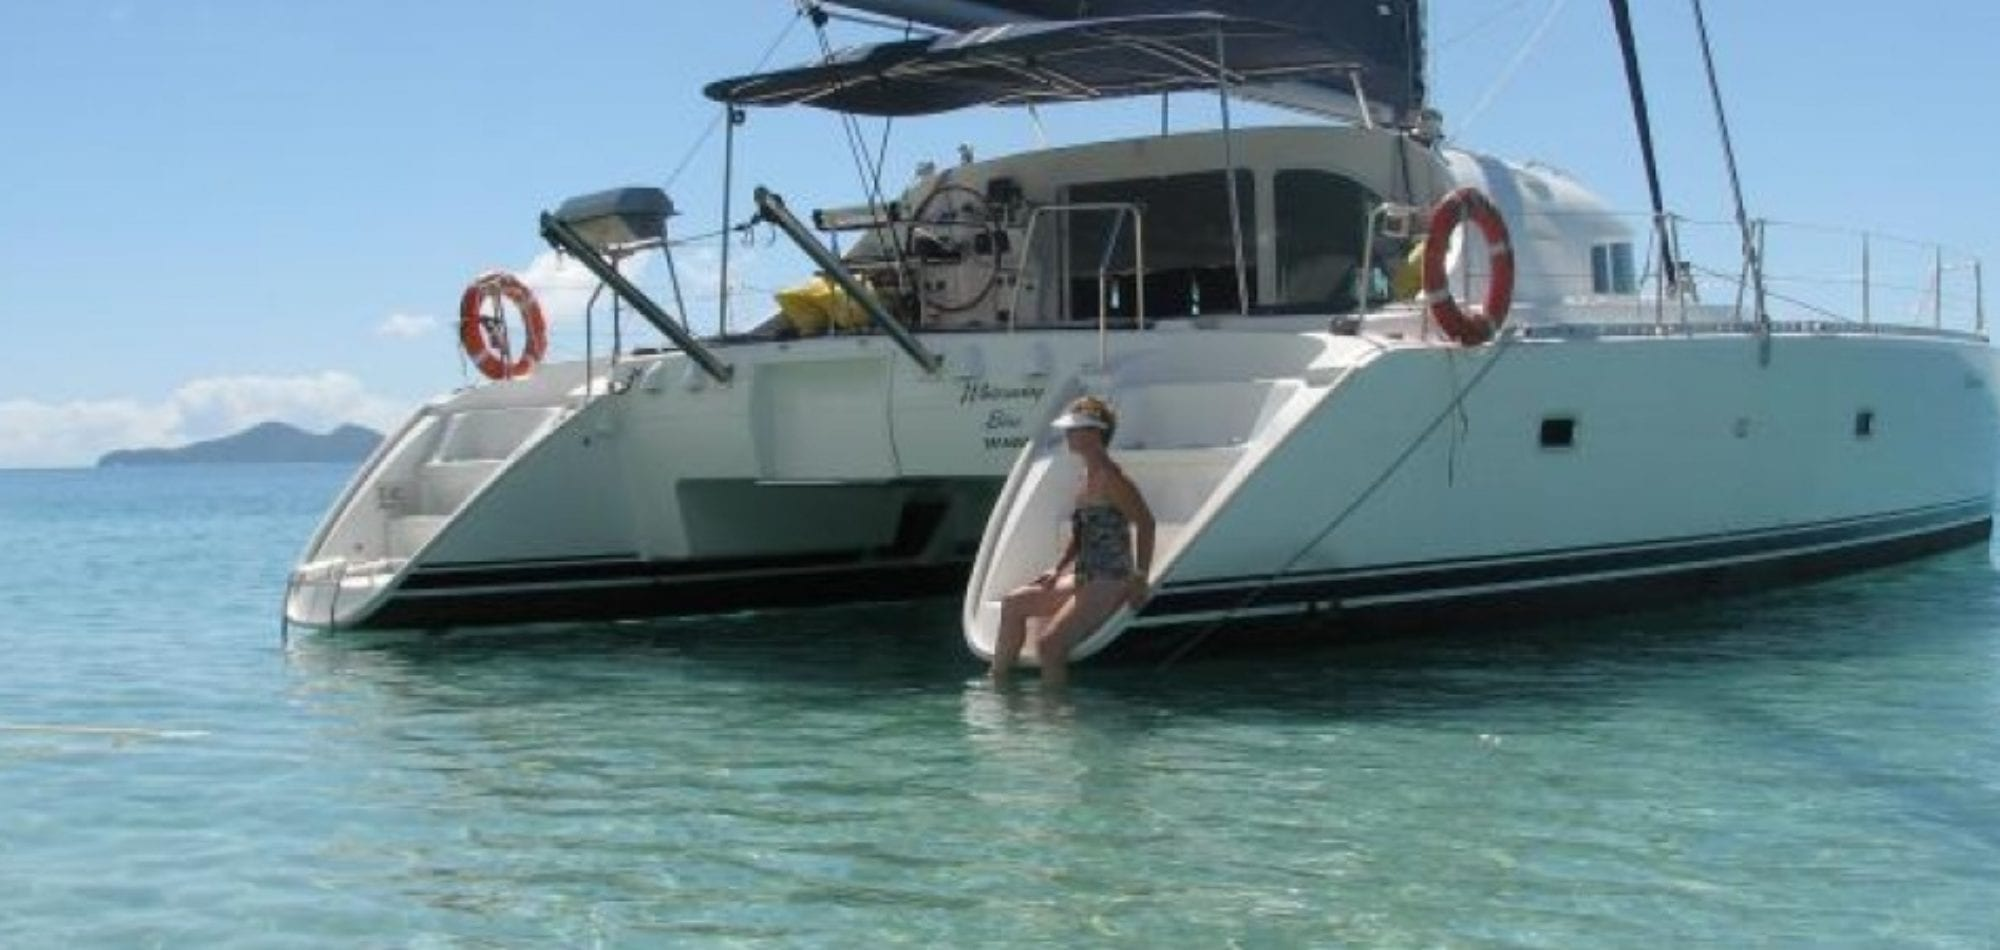 Dive in Australia - Whitsunday Blue sailing catamaran